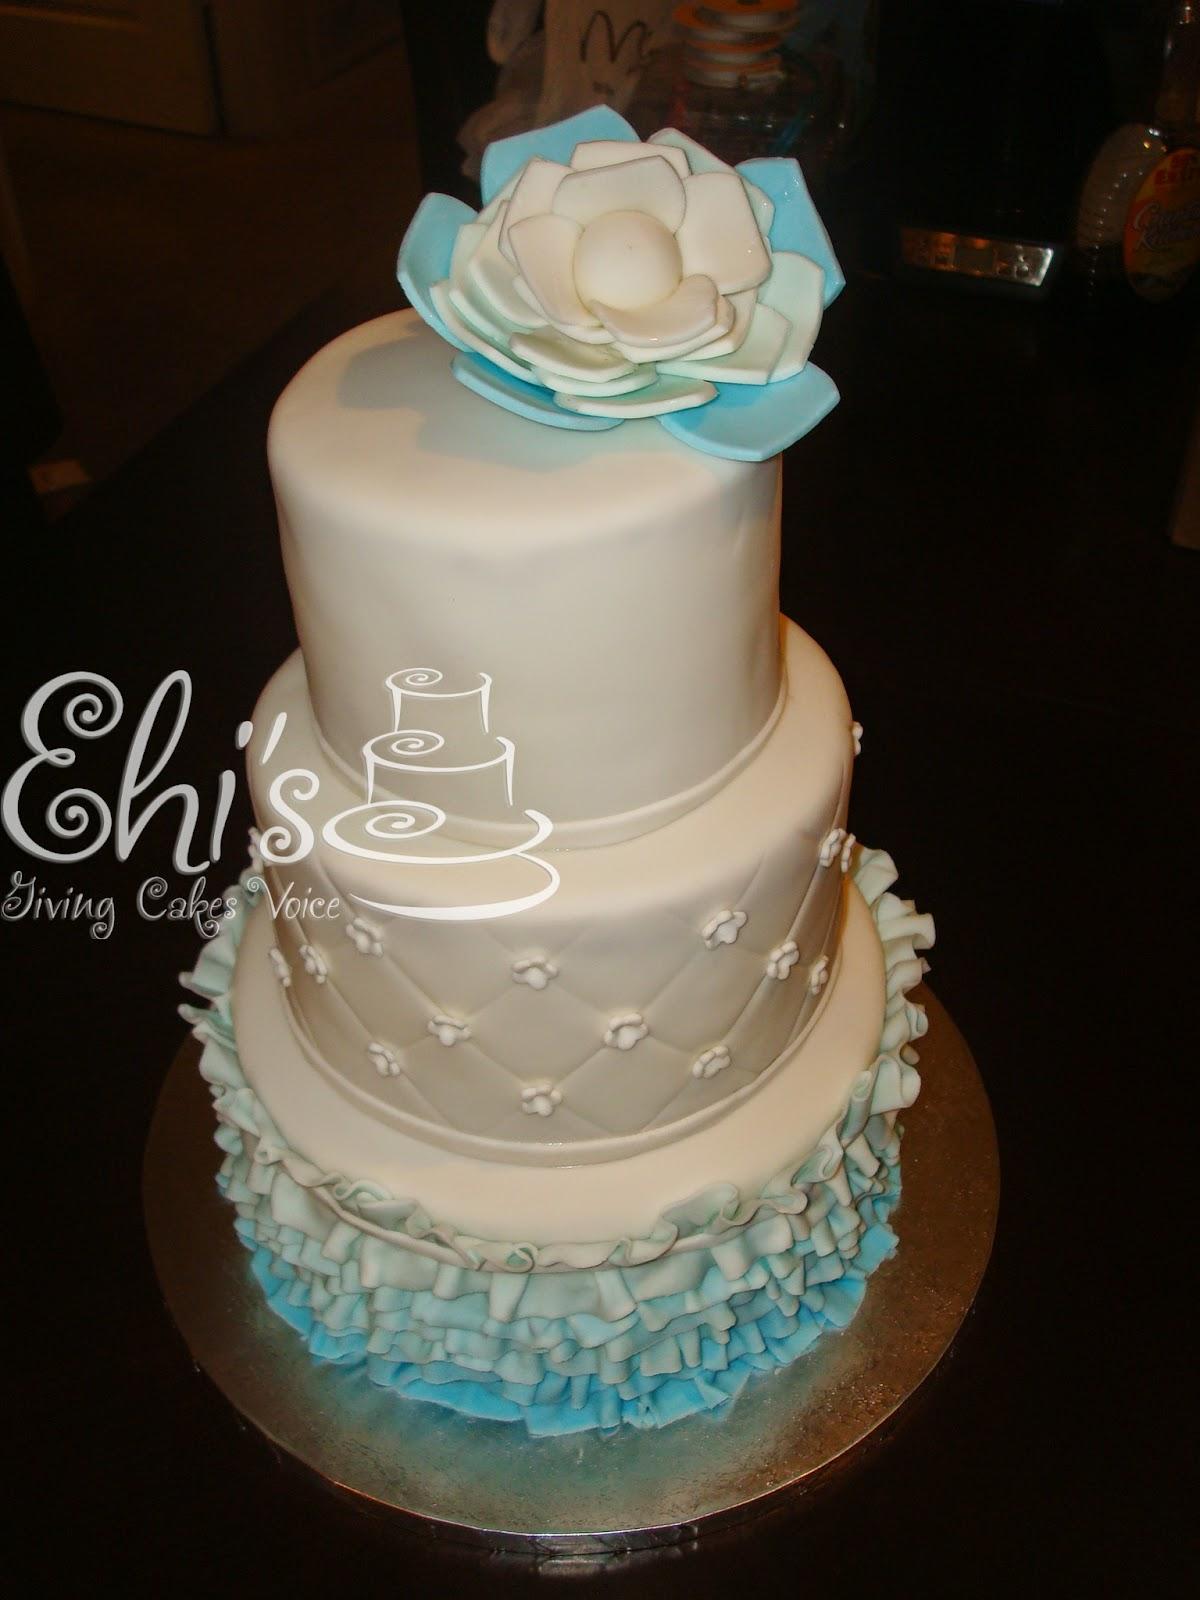 Ehis Sweet Talks 2014 WEDDING CAKES TREND - Wedding Cakes 2014